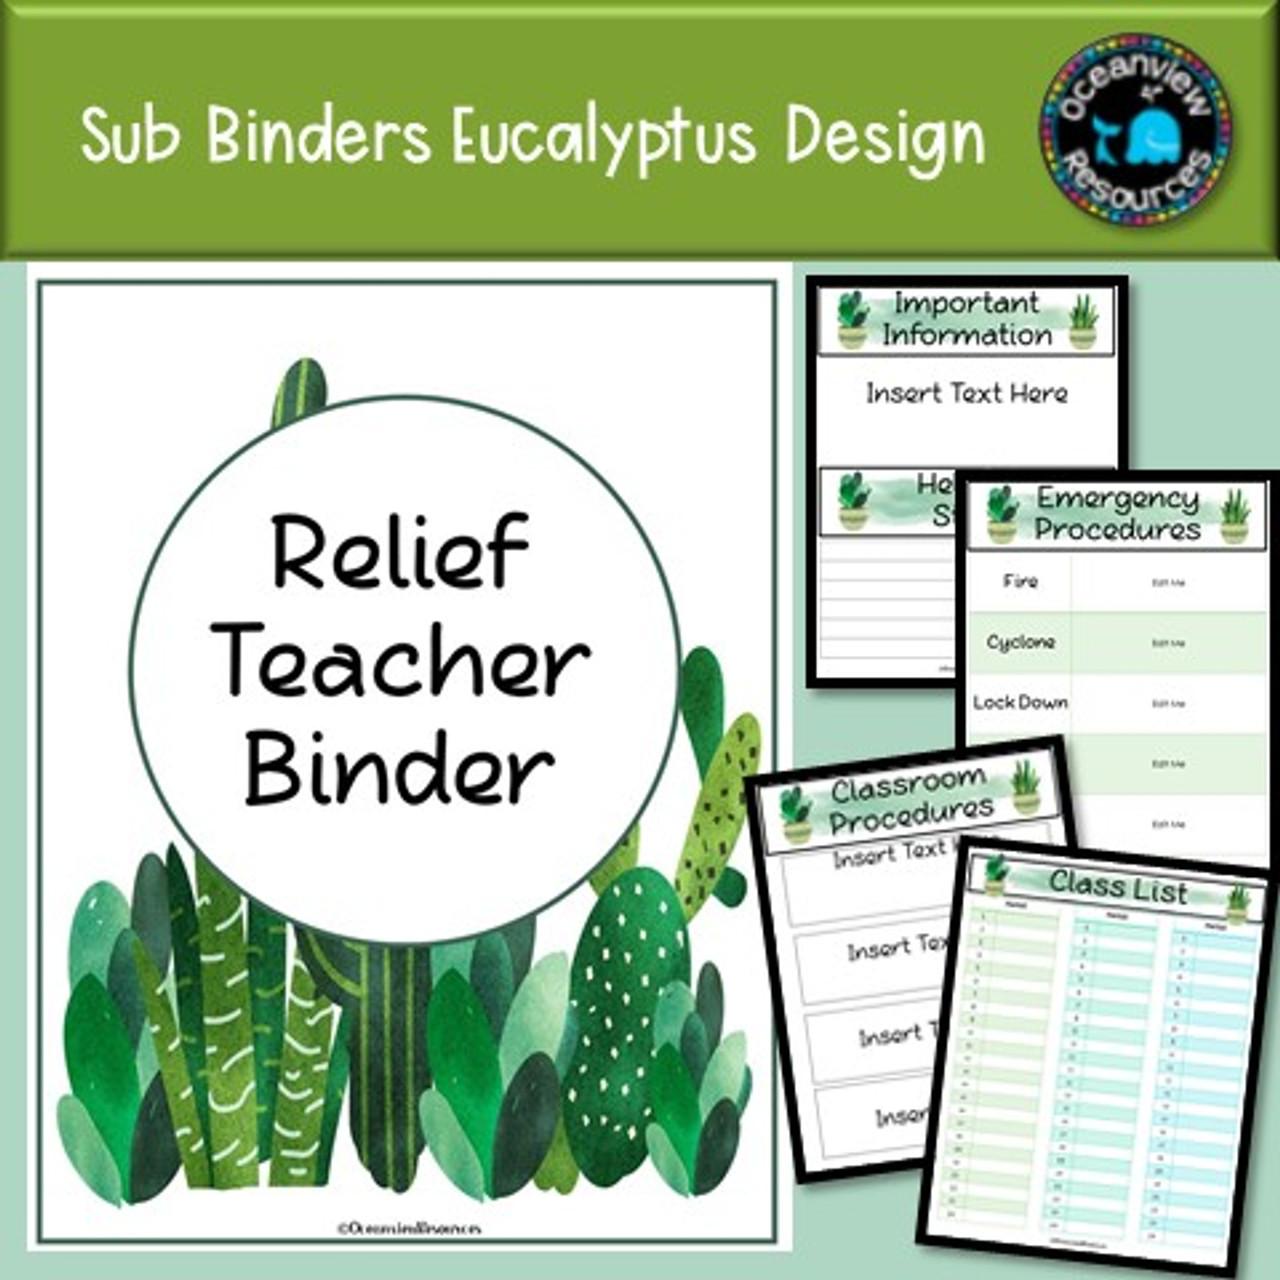 Sub Binder, Relief Teacher Binder - Cactus Design